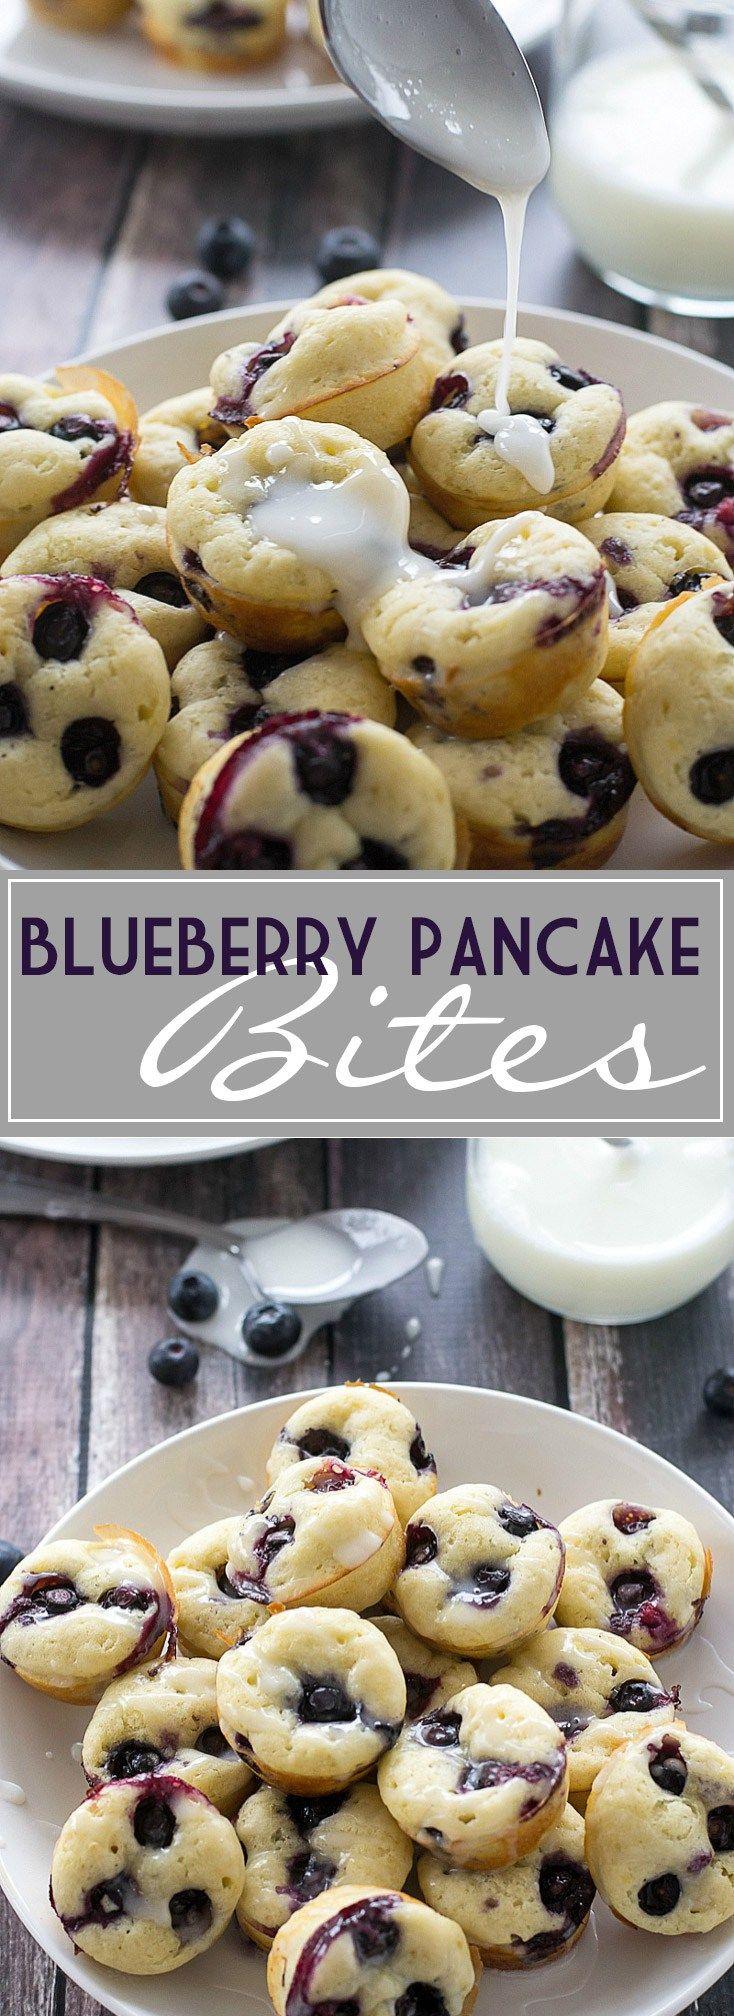 Blueberry Pancake Bites | www.motherthyme.com